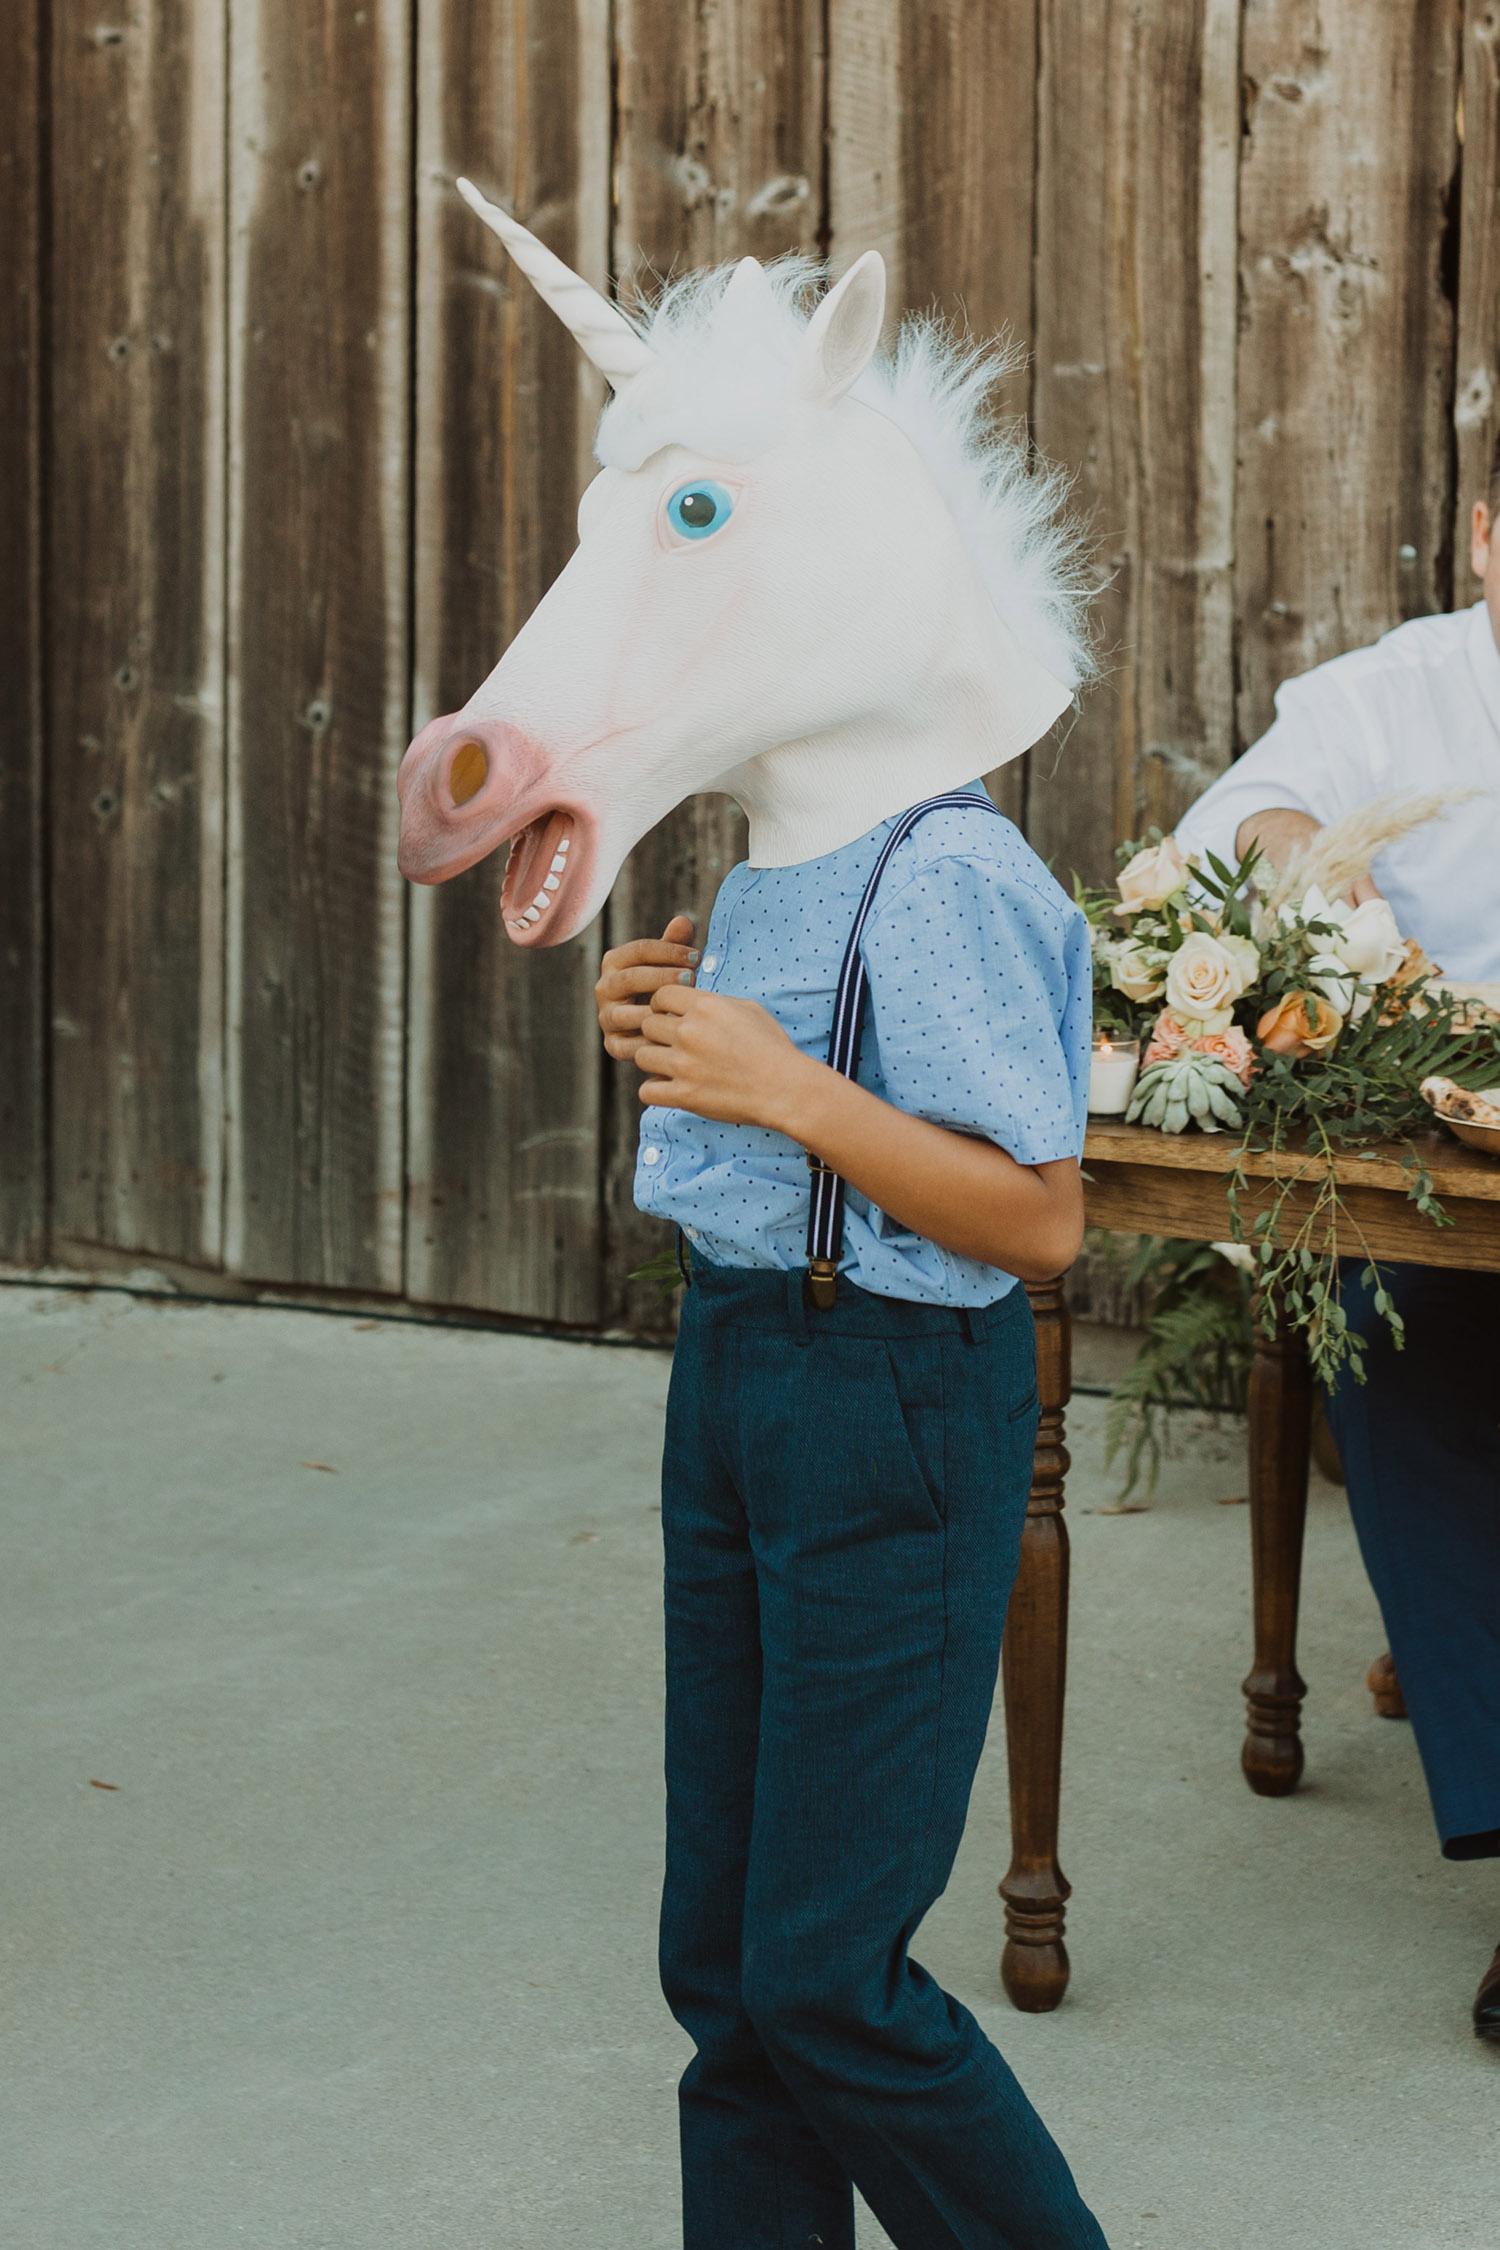 Milk+and+thistle+higuera+ranch+california+wedding+Tina+greg-4876.jpg